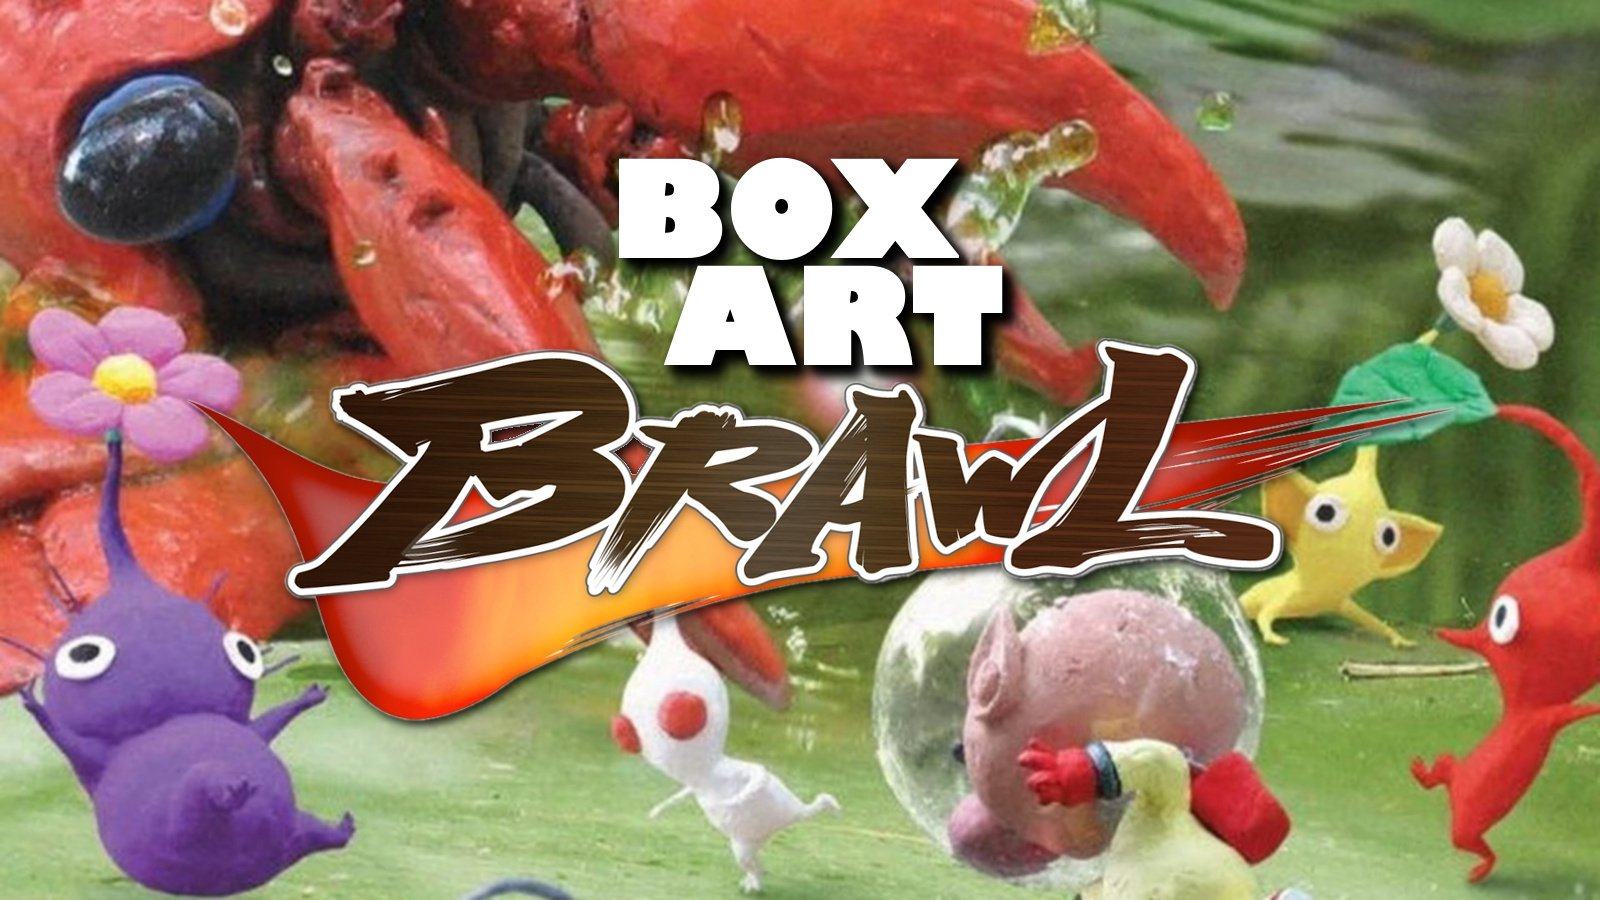 Poll Box Art Brawl 42 Pikmin 2 Nintendo Life